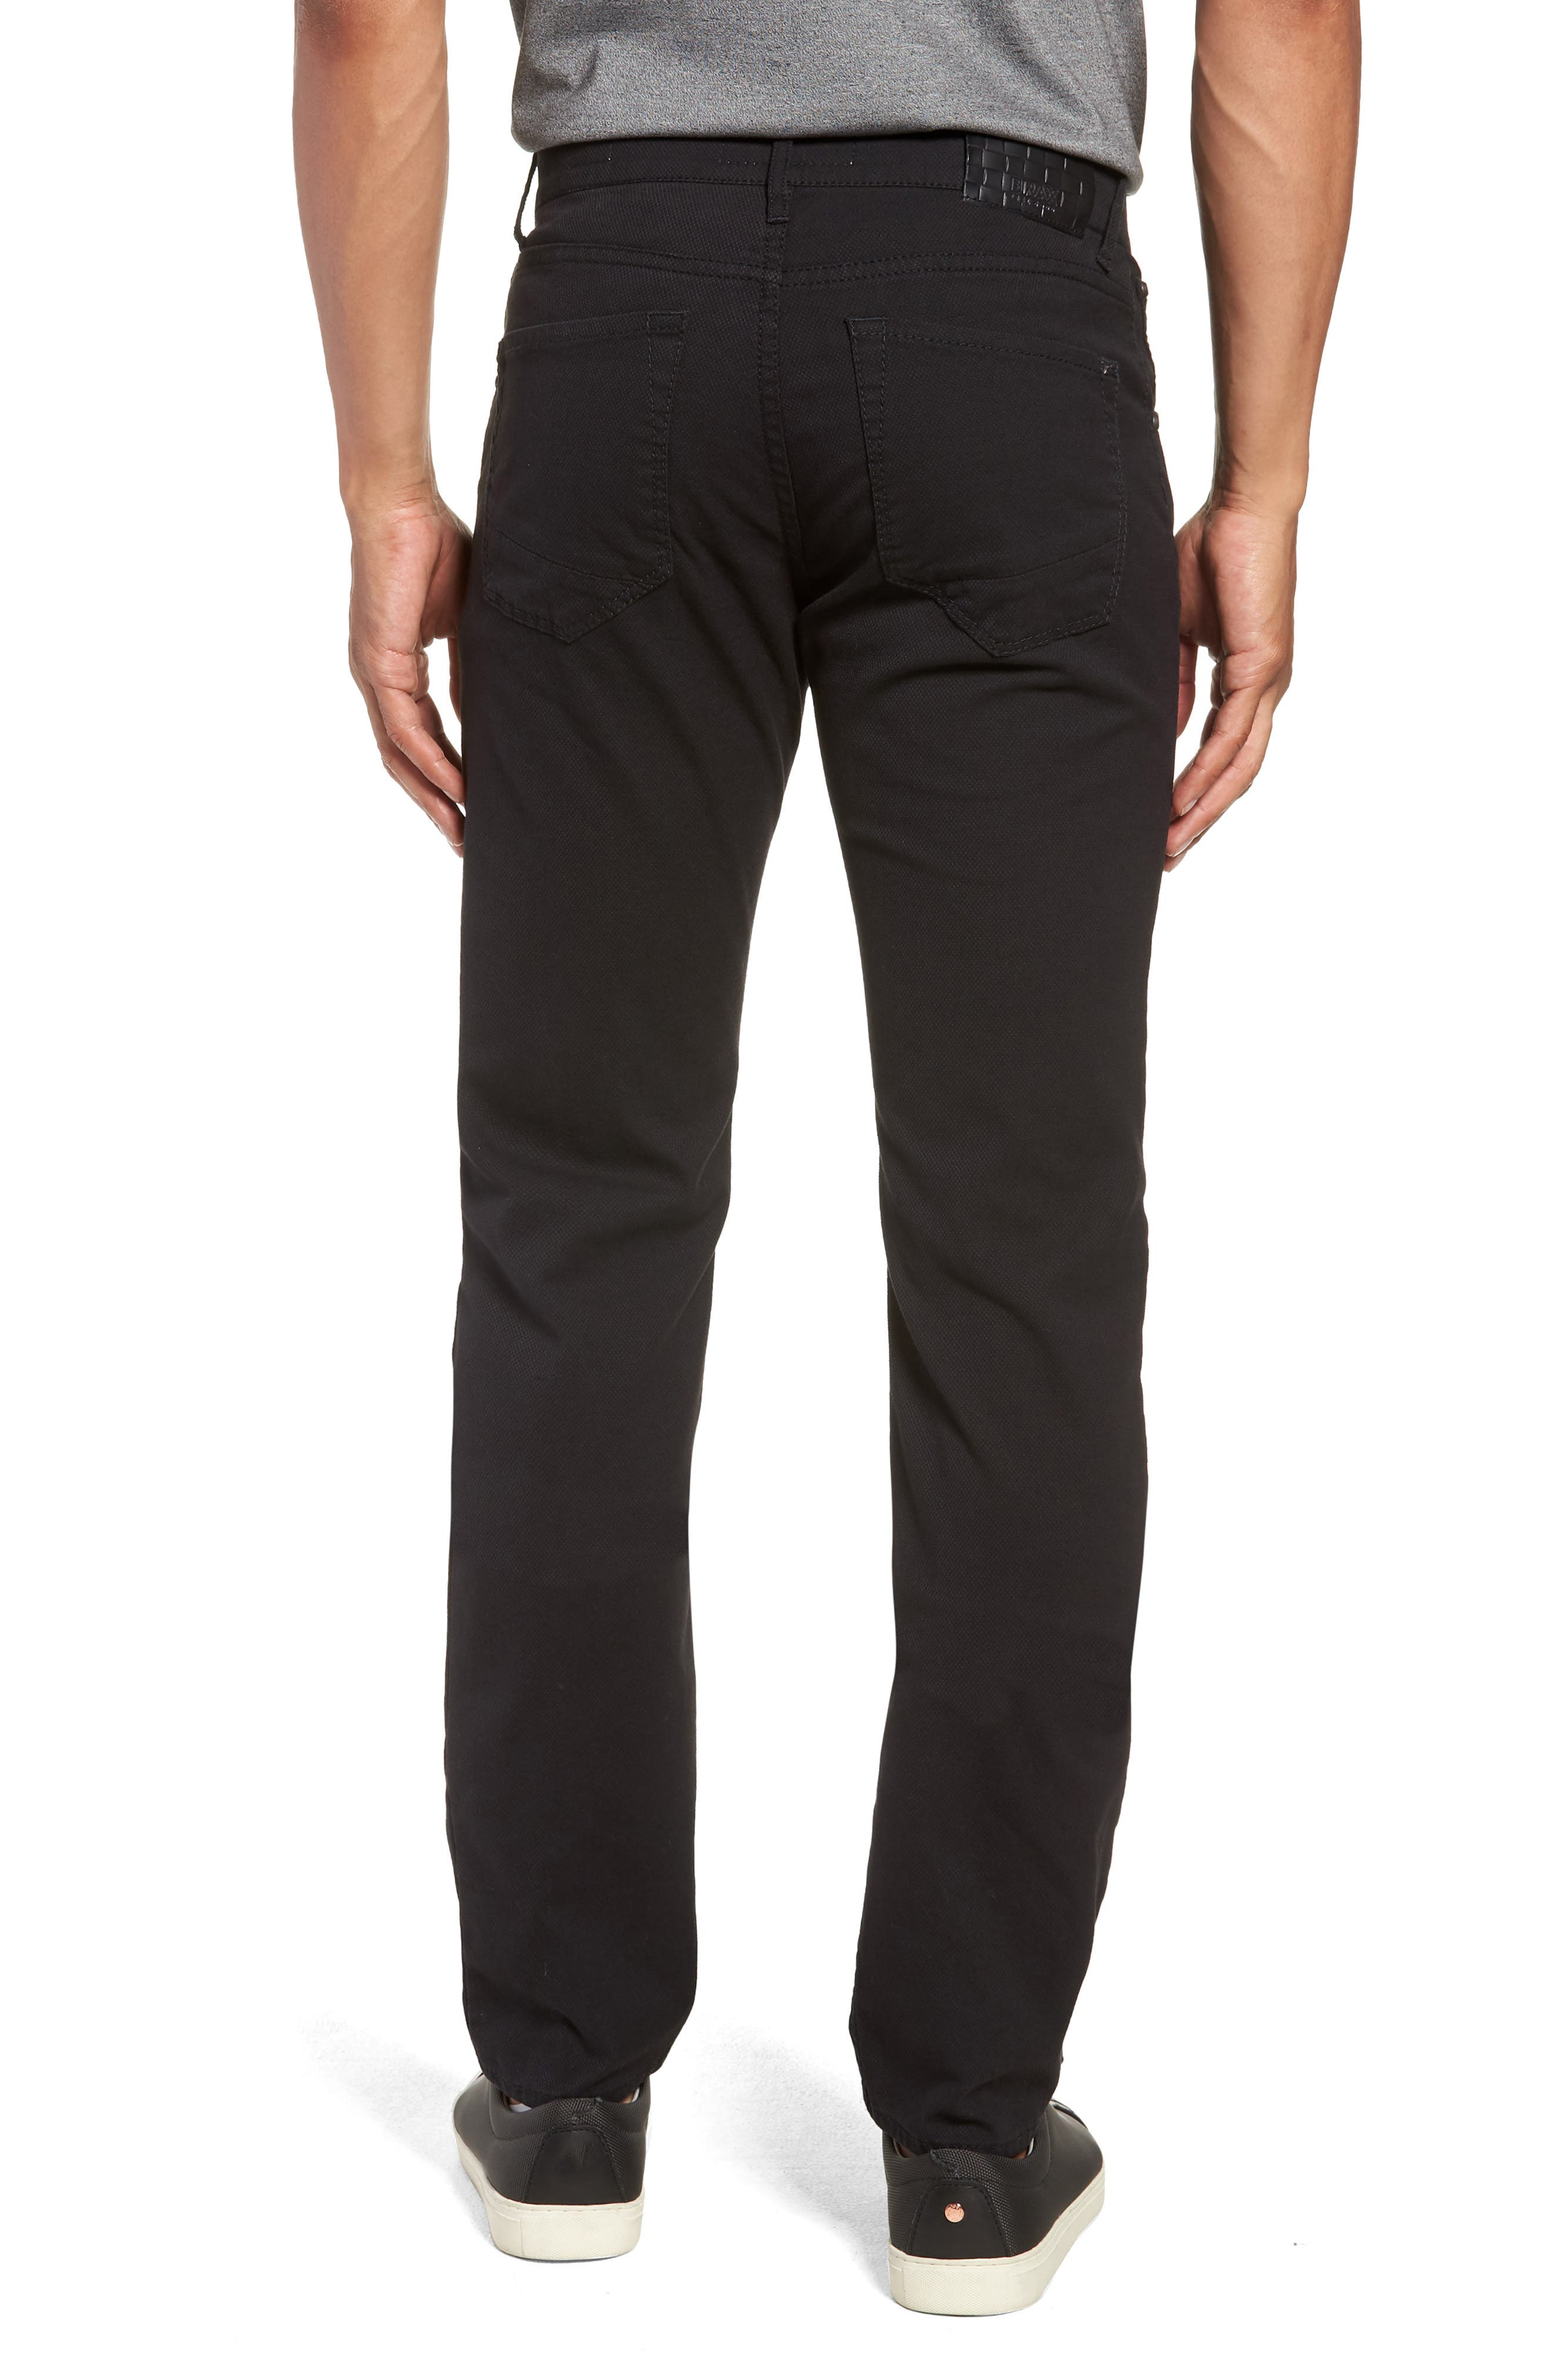 Woolook Diamond Slim Fit Pants,                             Alternate thumbnail 2, color,                             BLACK